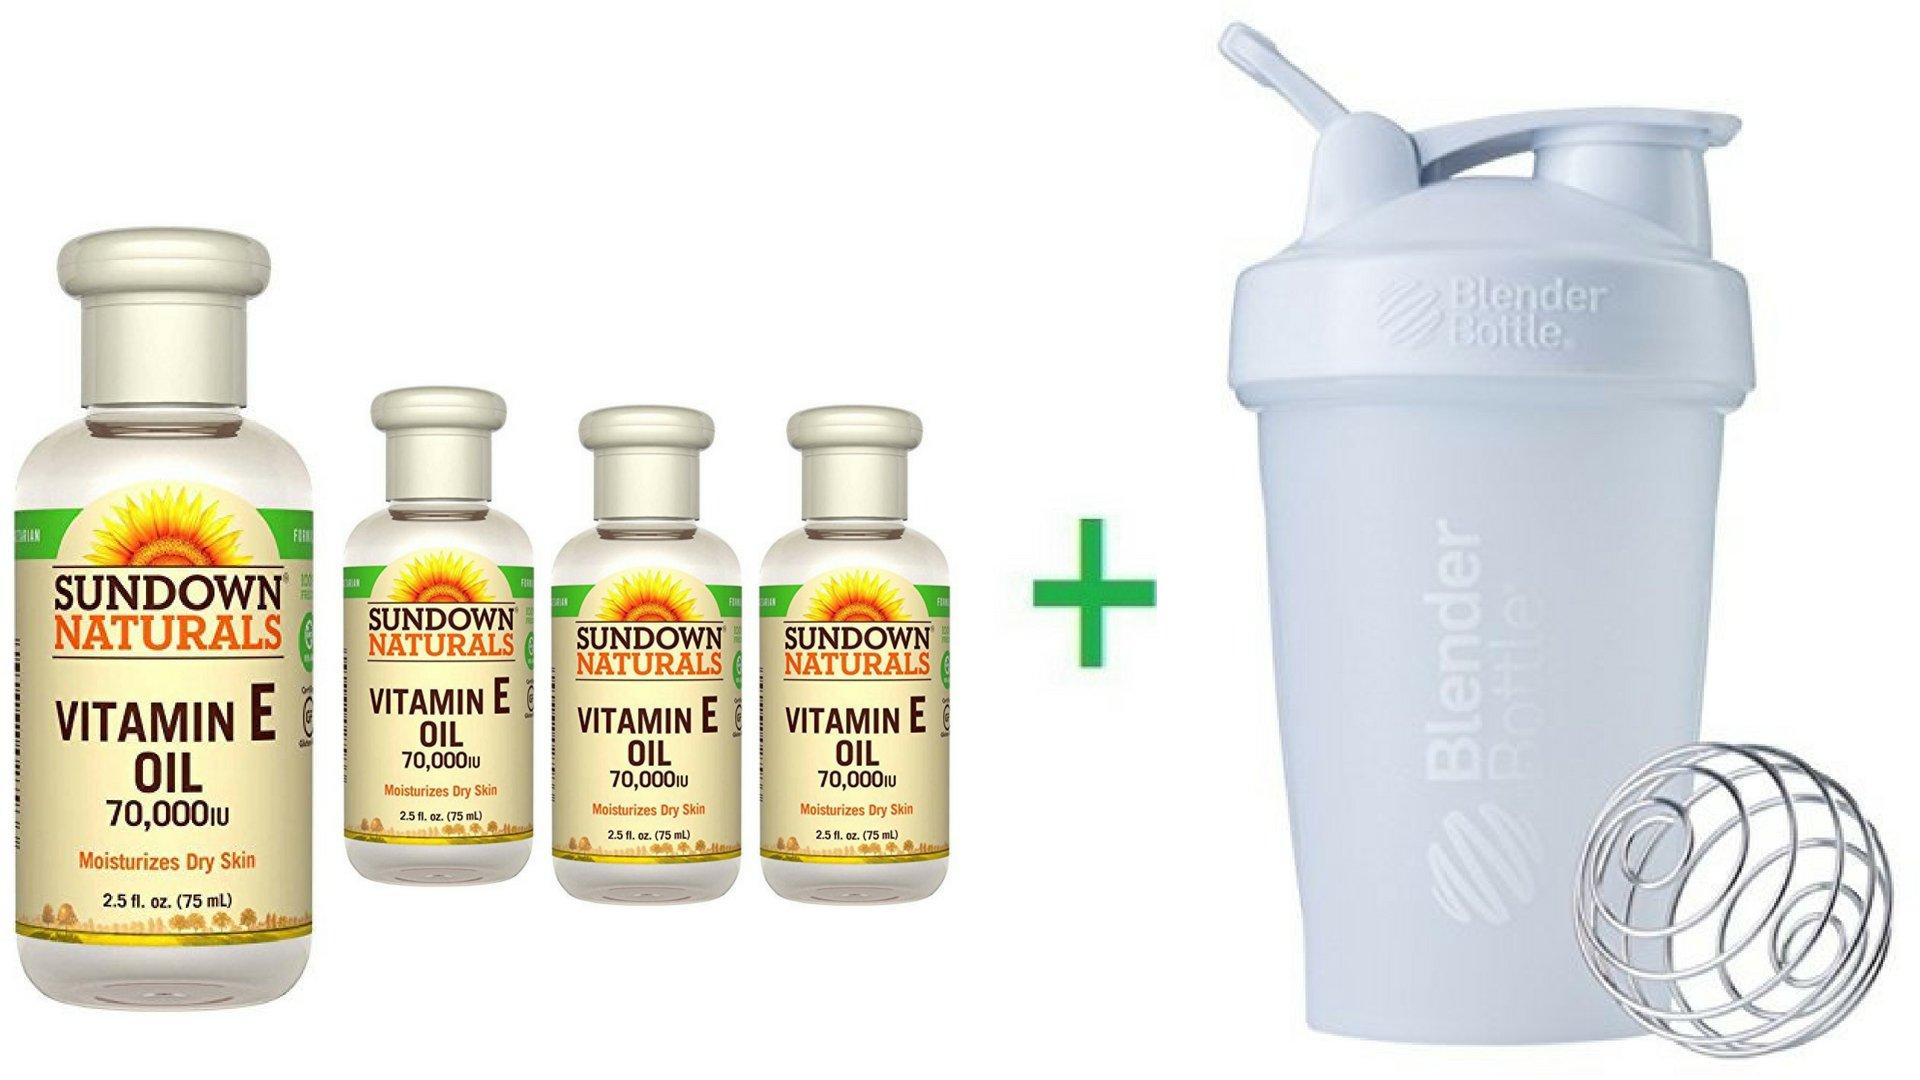 Sundown Naturals, Vitamin E Oil, 70,000 IU, 2.5 fl oz (75 ml) (4 Packs) + Sundesa, BlenderBottle, Classic With Loop, White, 20 oz